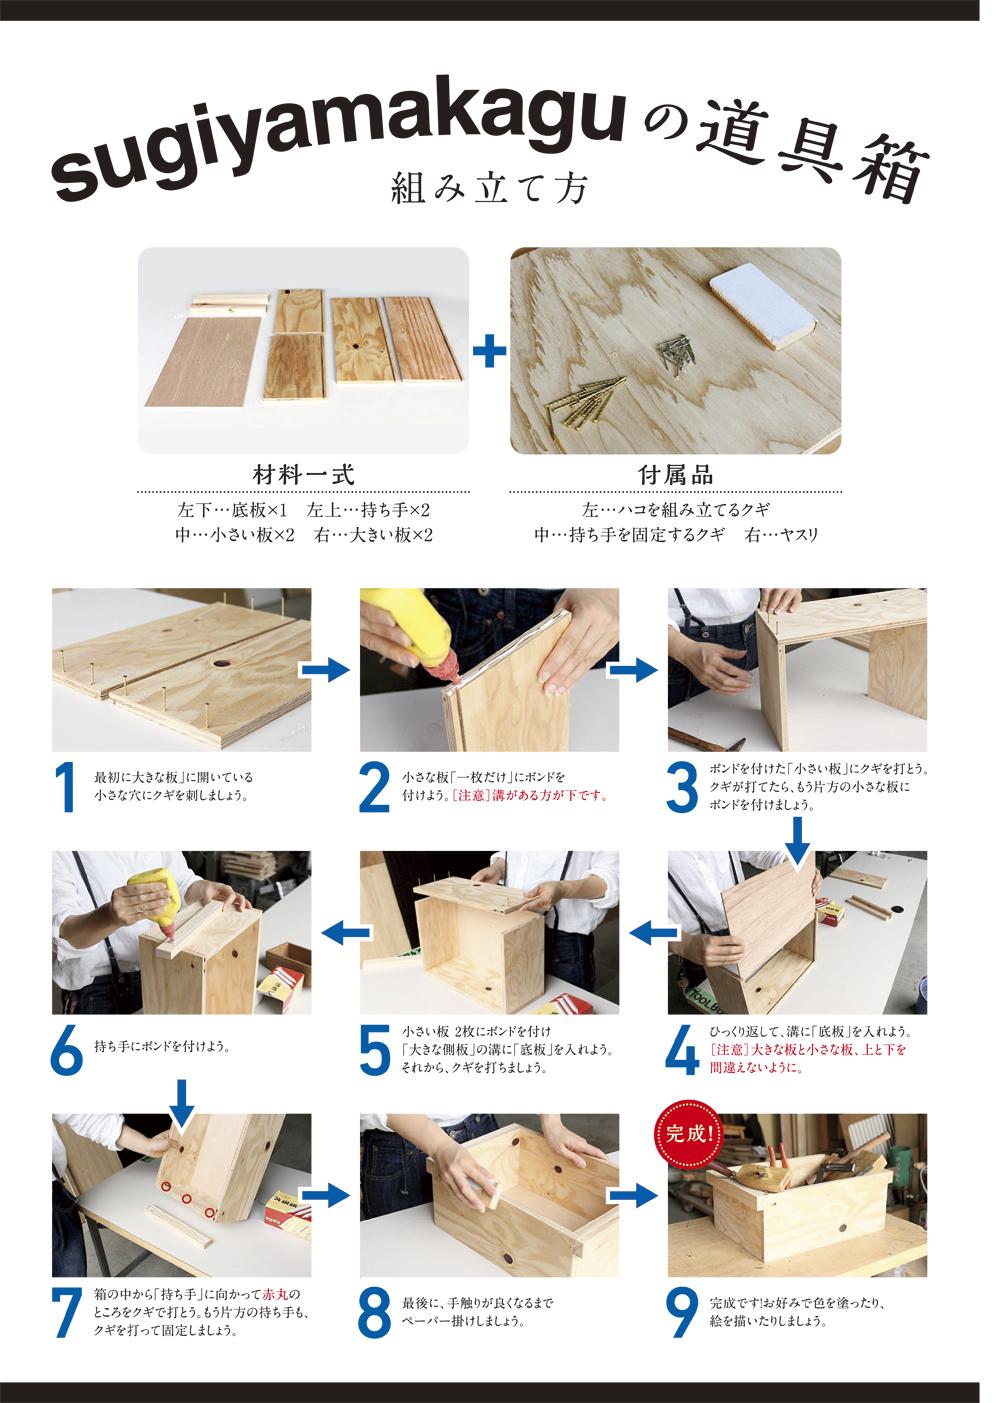 sugiyamakagu-tool-box3